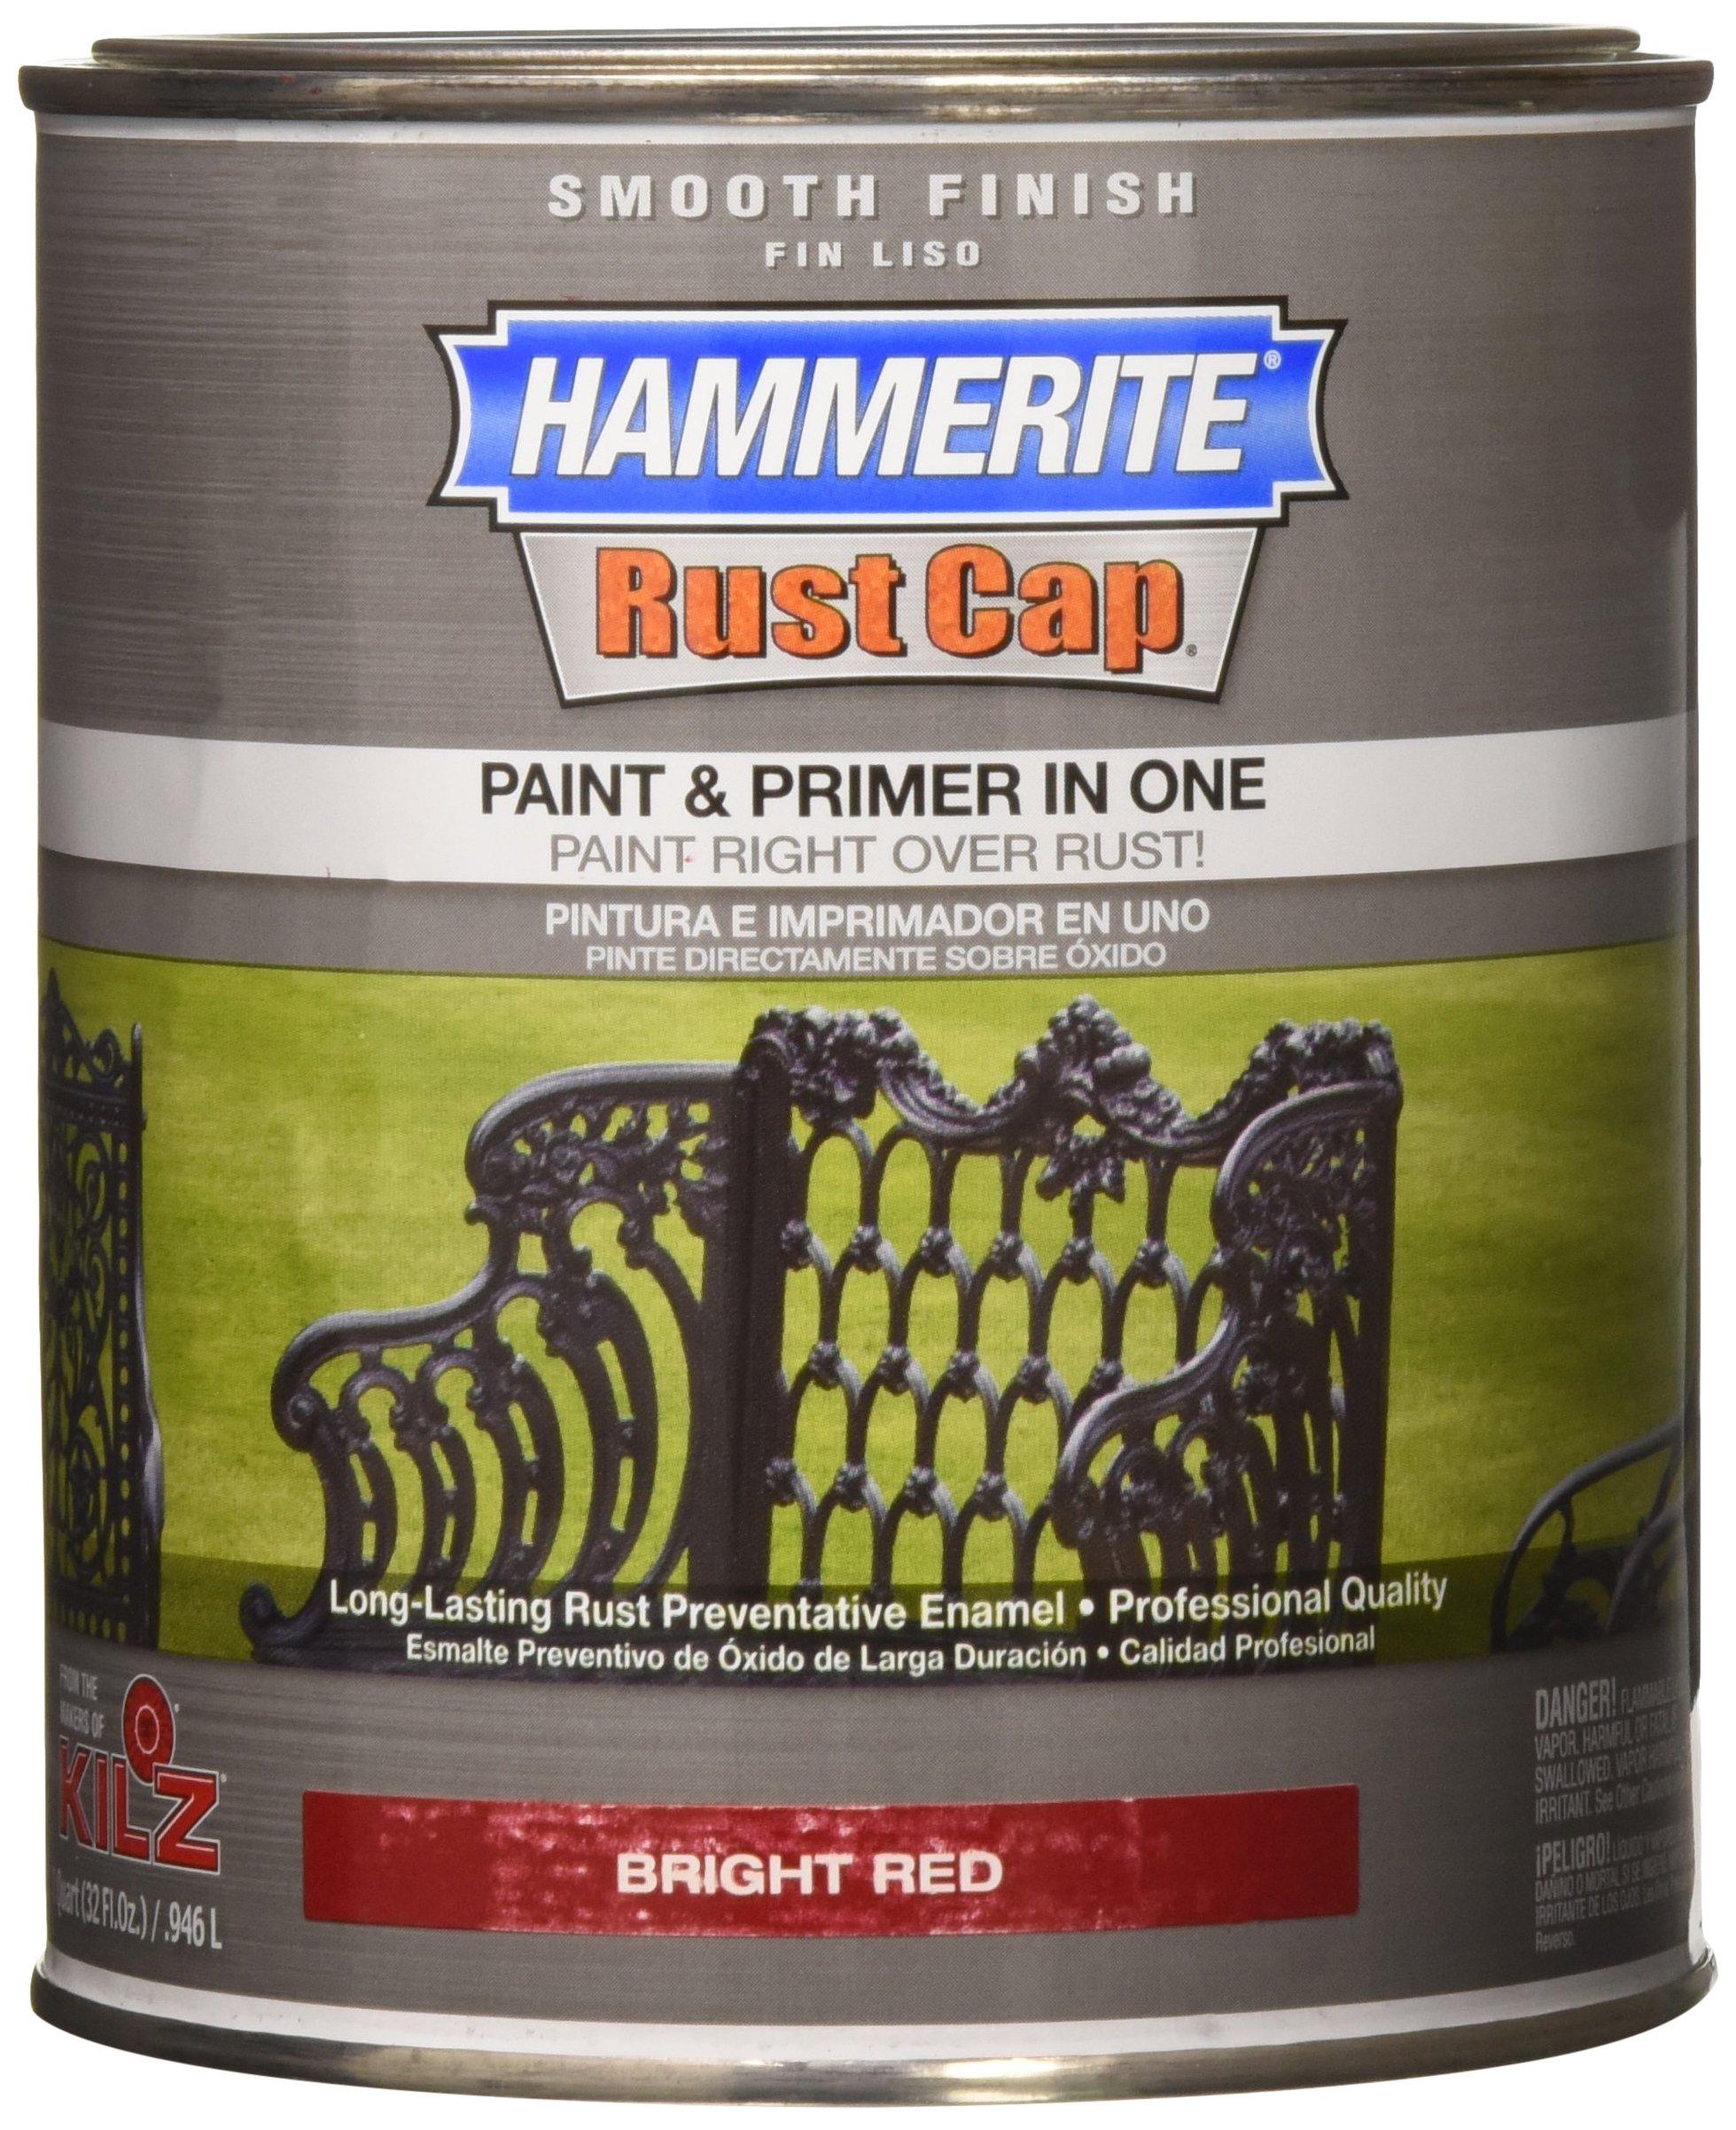 Hammerite 44210 Rust Cap Rust Preventative Paint Smooth Finish Bright Red 1 Qt